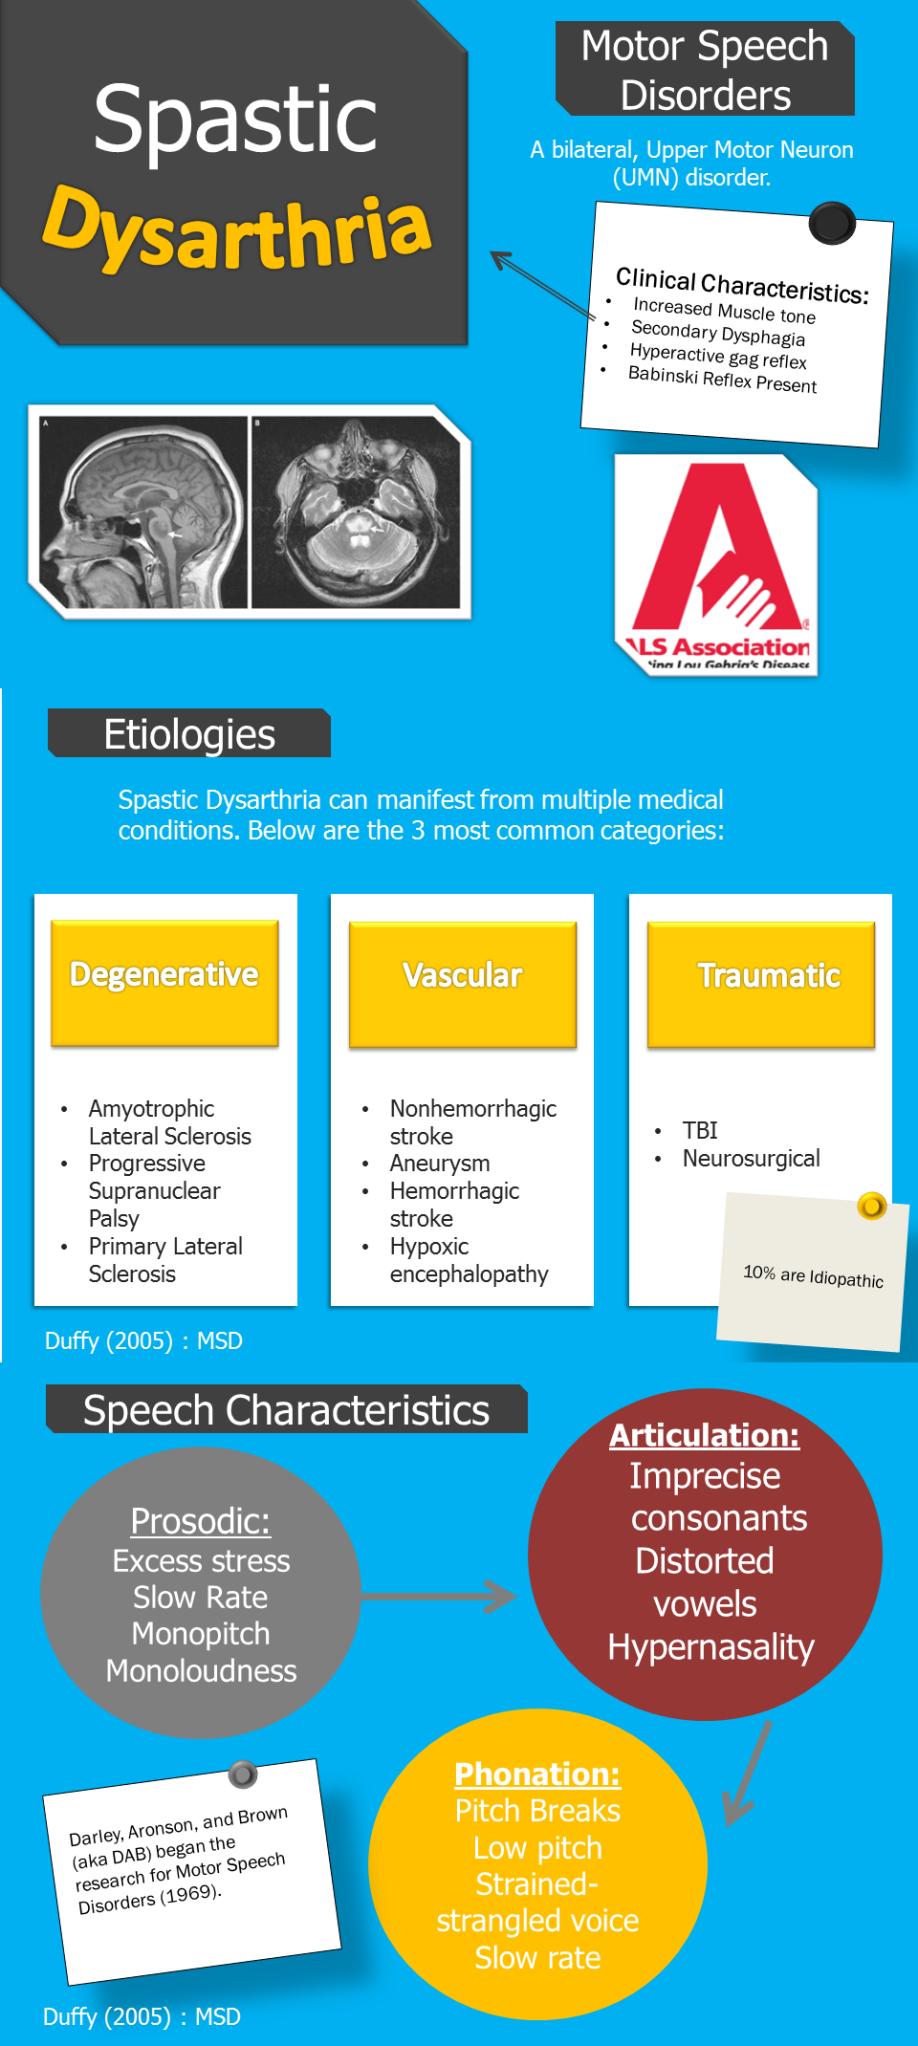 Spastic Dysarthria